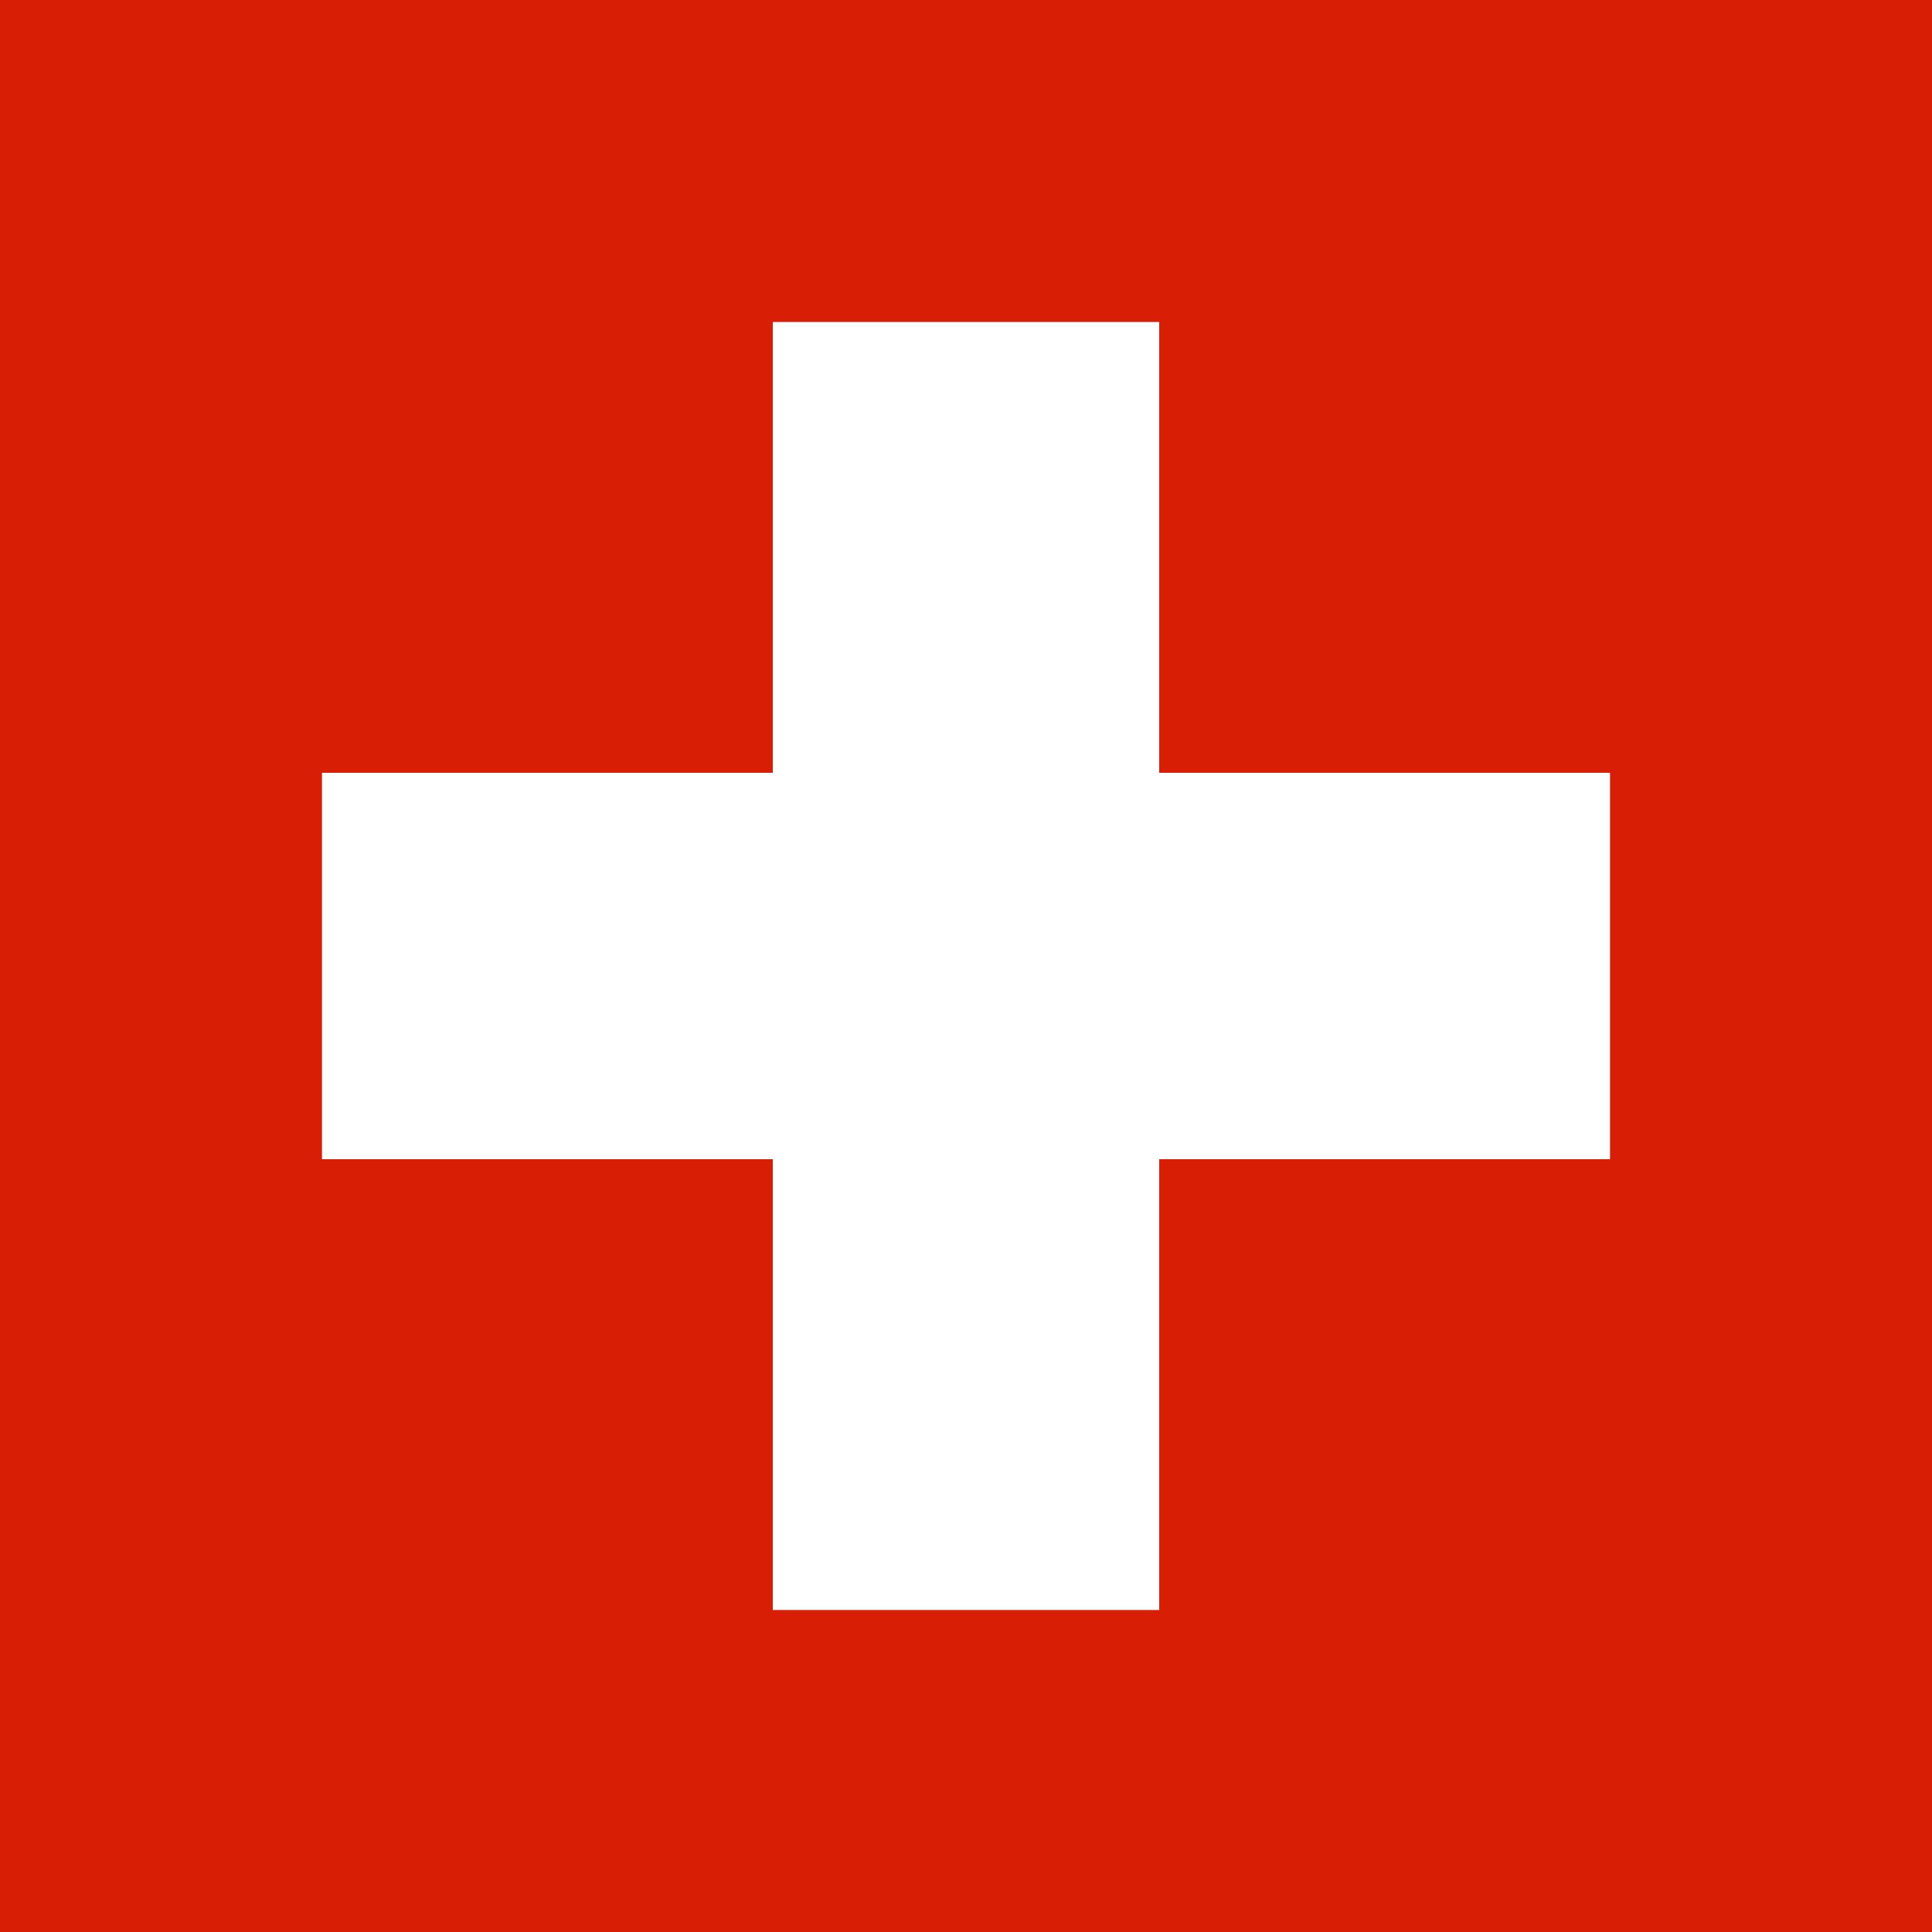 Svizzera, paese, emblema, logo, simbolo - Sfondi HD - Professor-falken.com